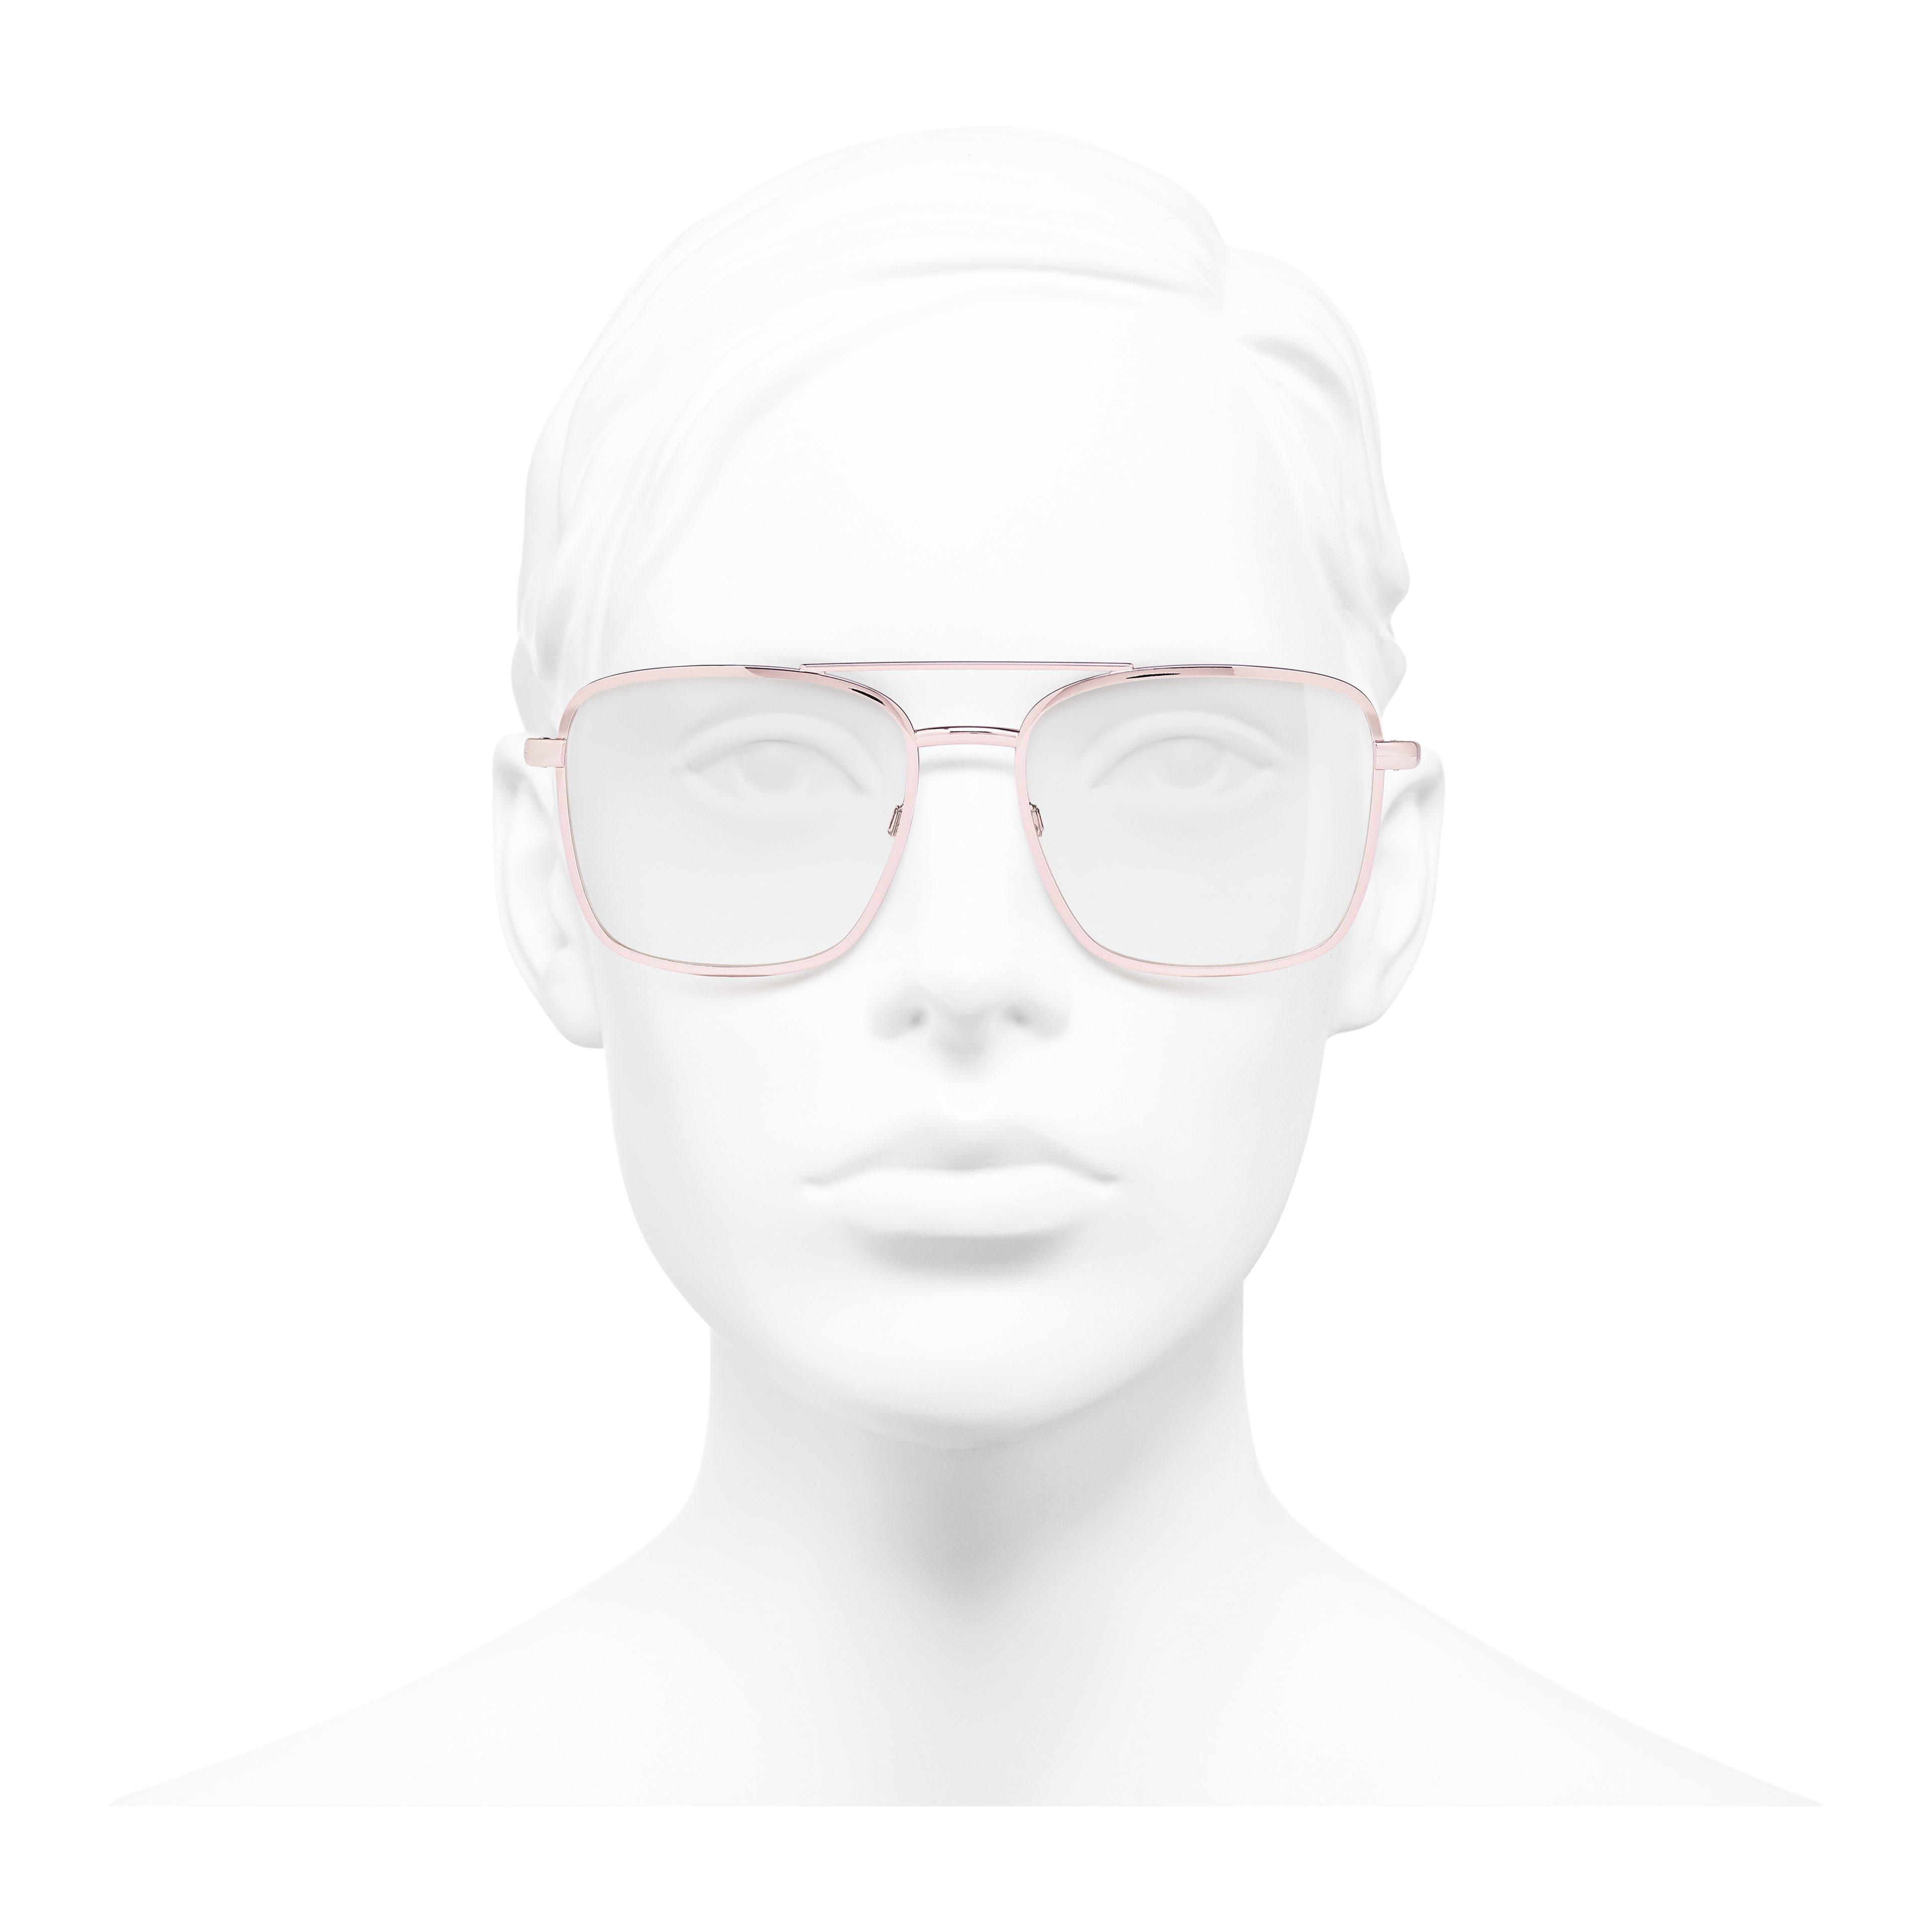 Pilot Eyeglasses Metal Pink Gold -                                                                     view 2 - see full sized version